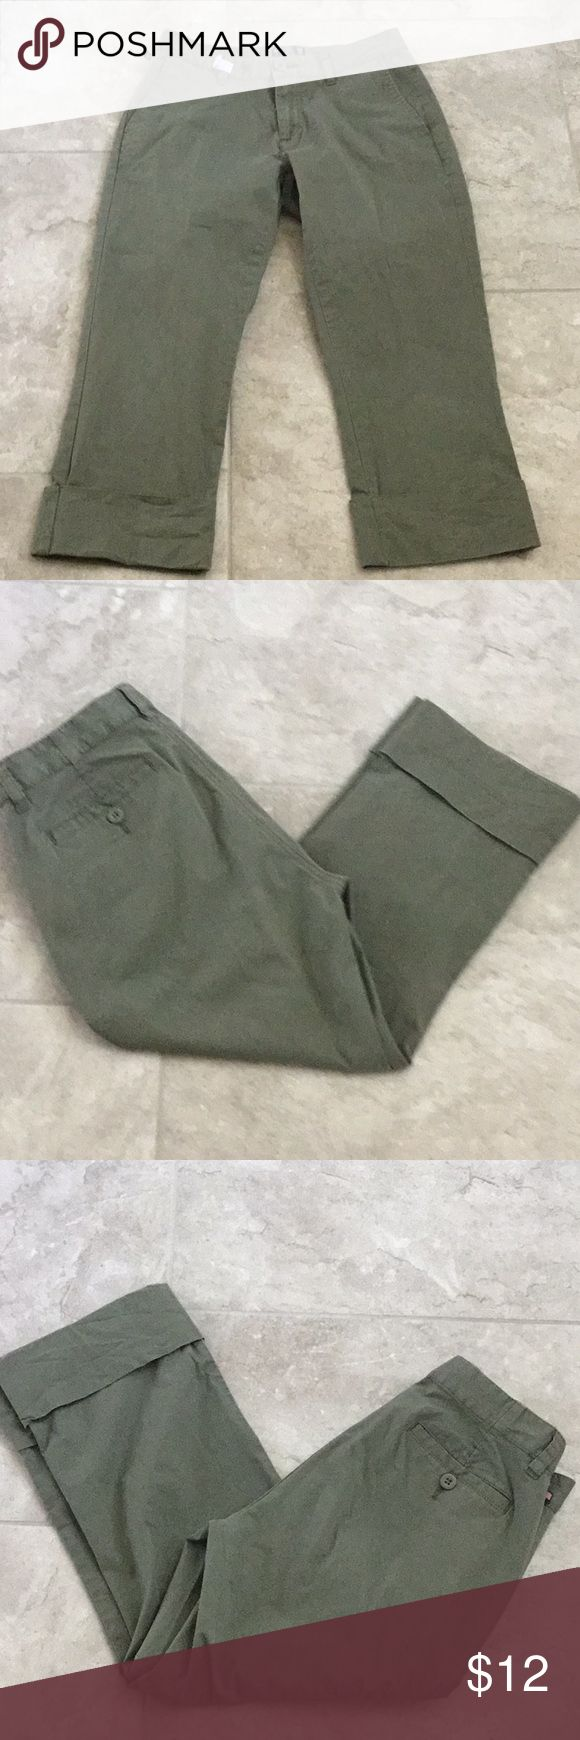 "Polo Jeans Co. Ralph Lauren Capri Pants Size 6 Polo Jeans Co. Ralph Lauren Capri Pants Size 6 Army Green Color Measures 14.5"" waist (29"" total) Inseam measures 21.5"" Leg opening 8"" Rise measures 8.5"" Thanks for looking! Polo by Ralph Lauren Pants Capris"